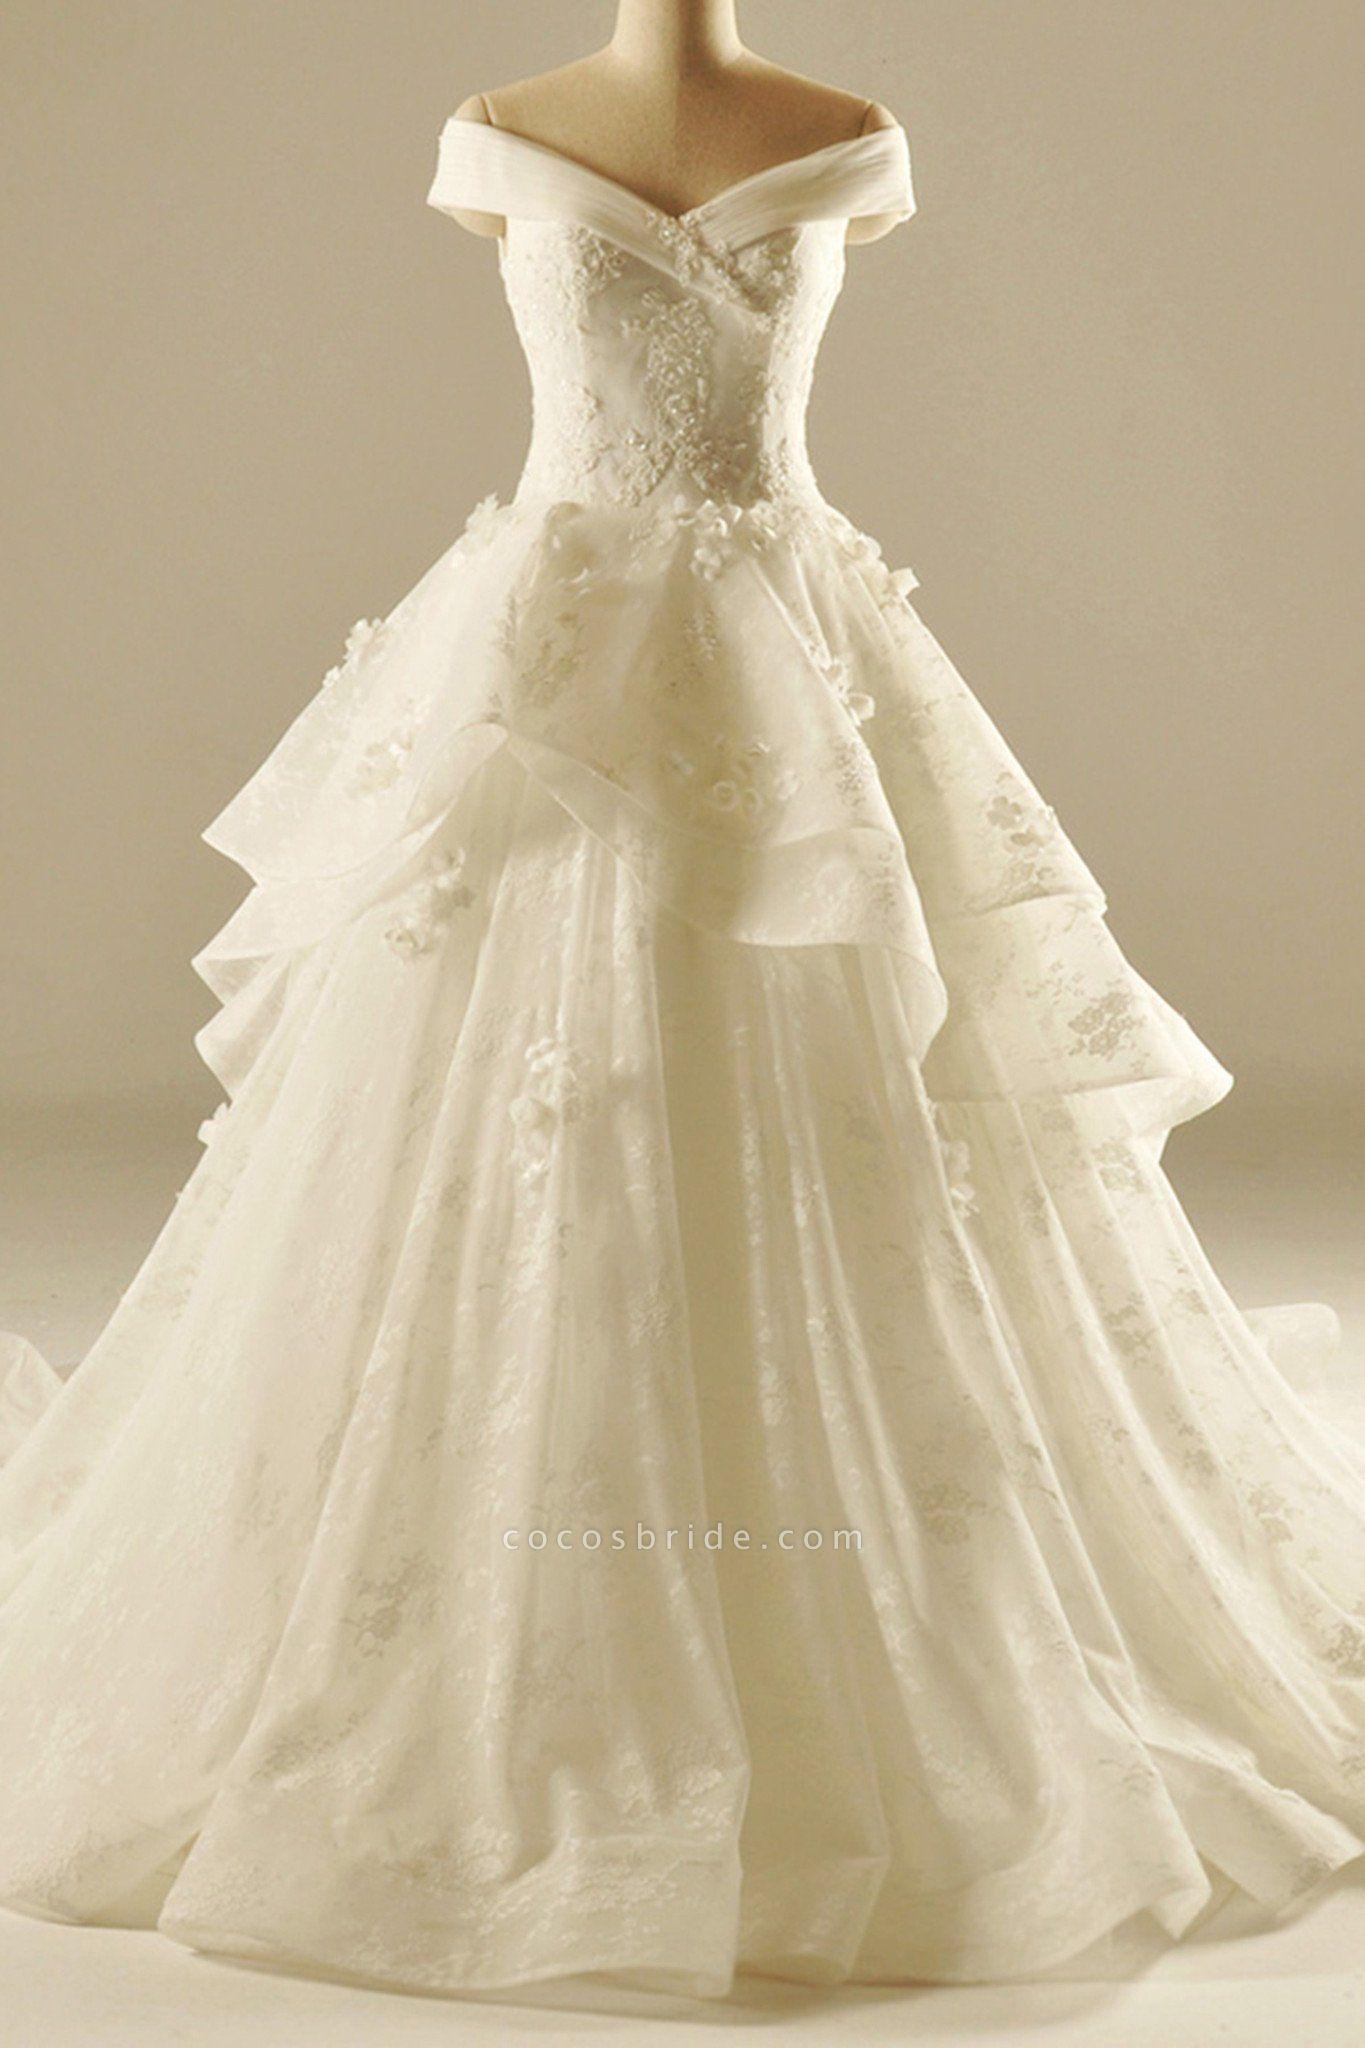 Ivory Organza Sweetheart Applique A-Line Elegant Wedding Dresses